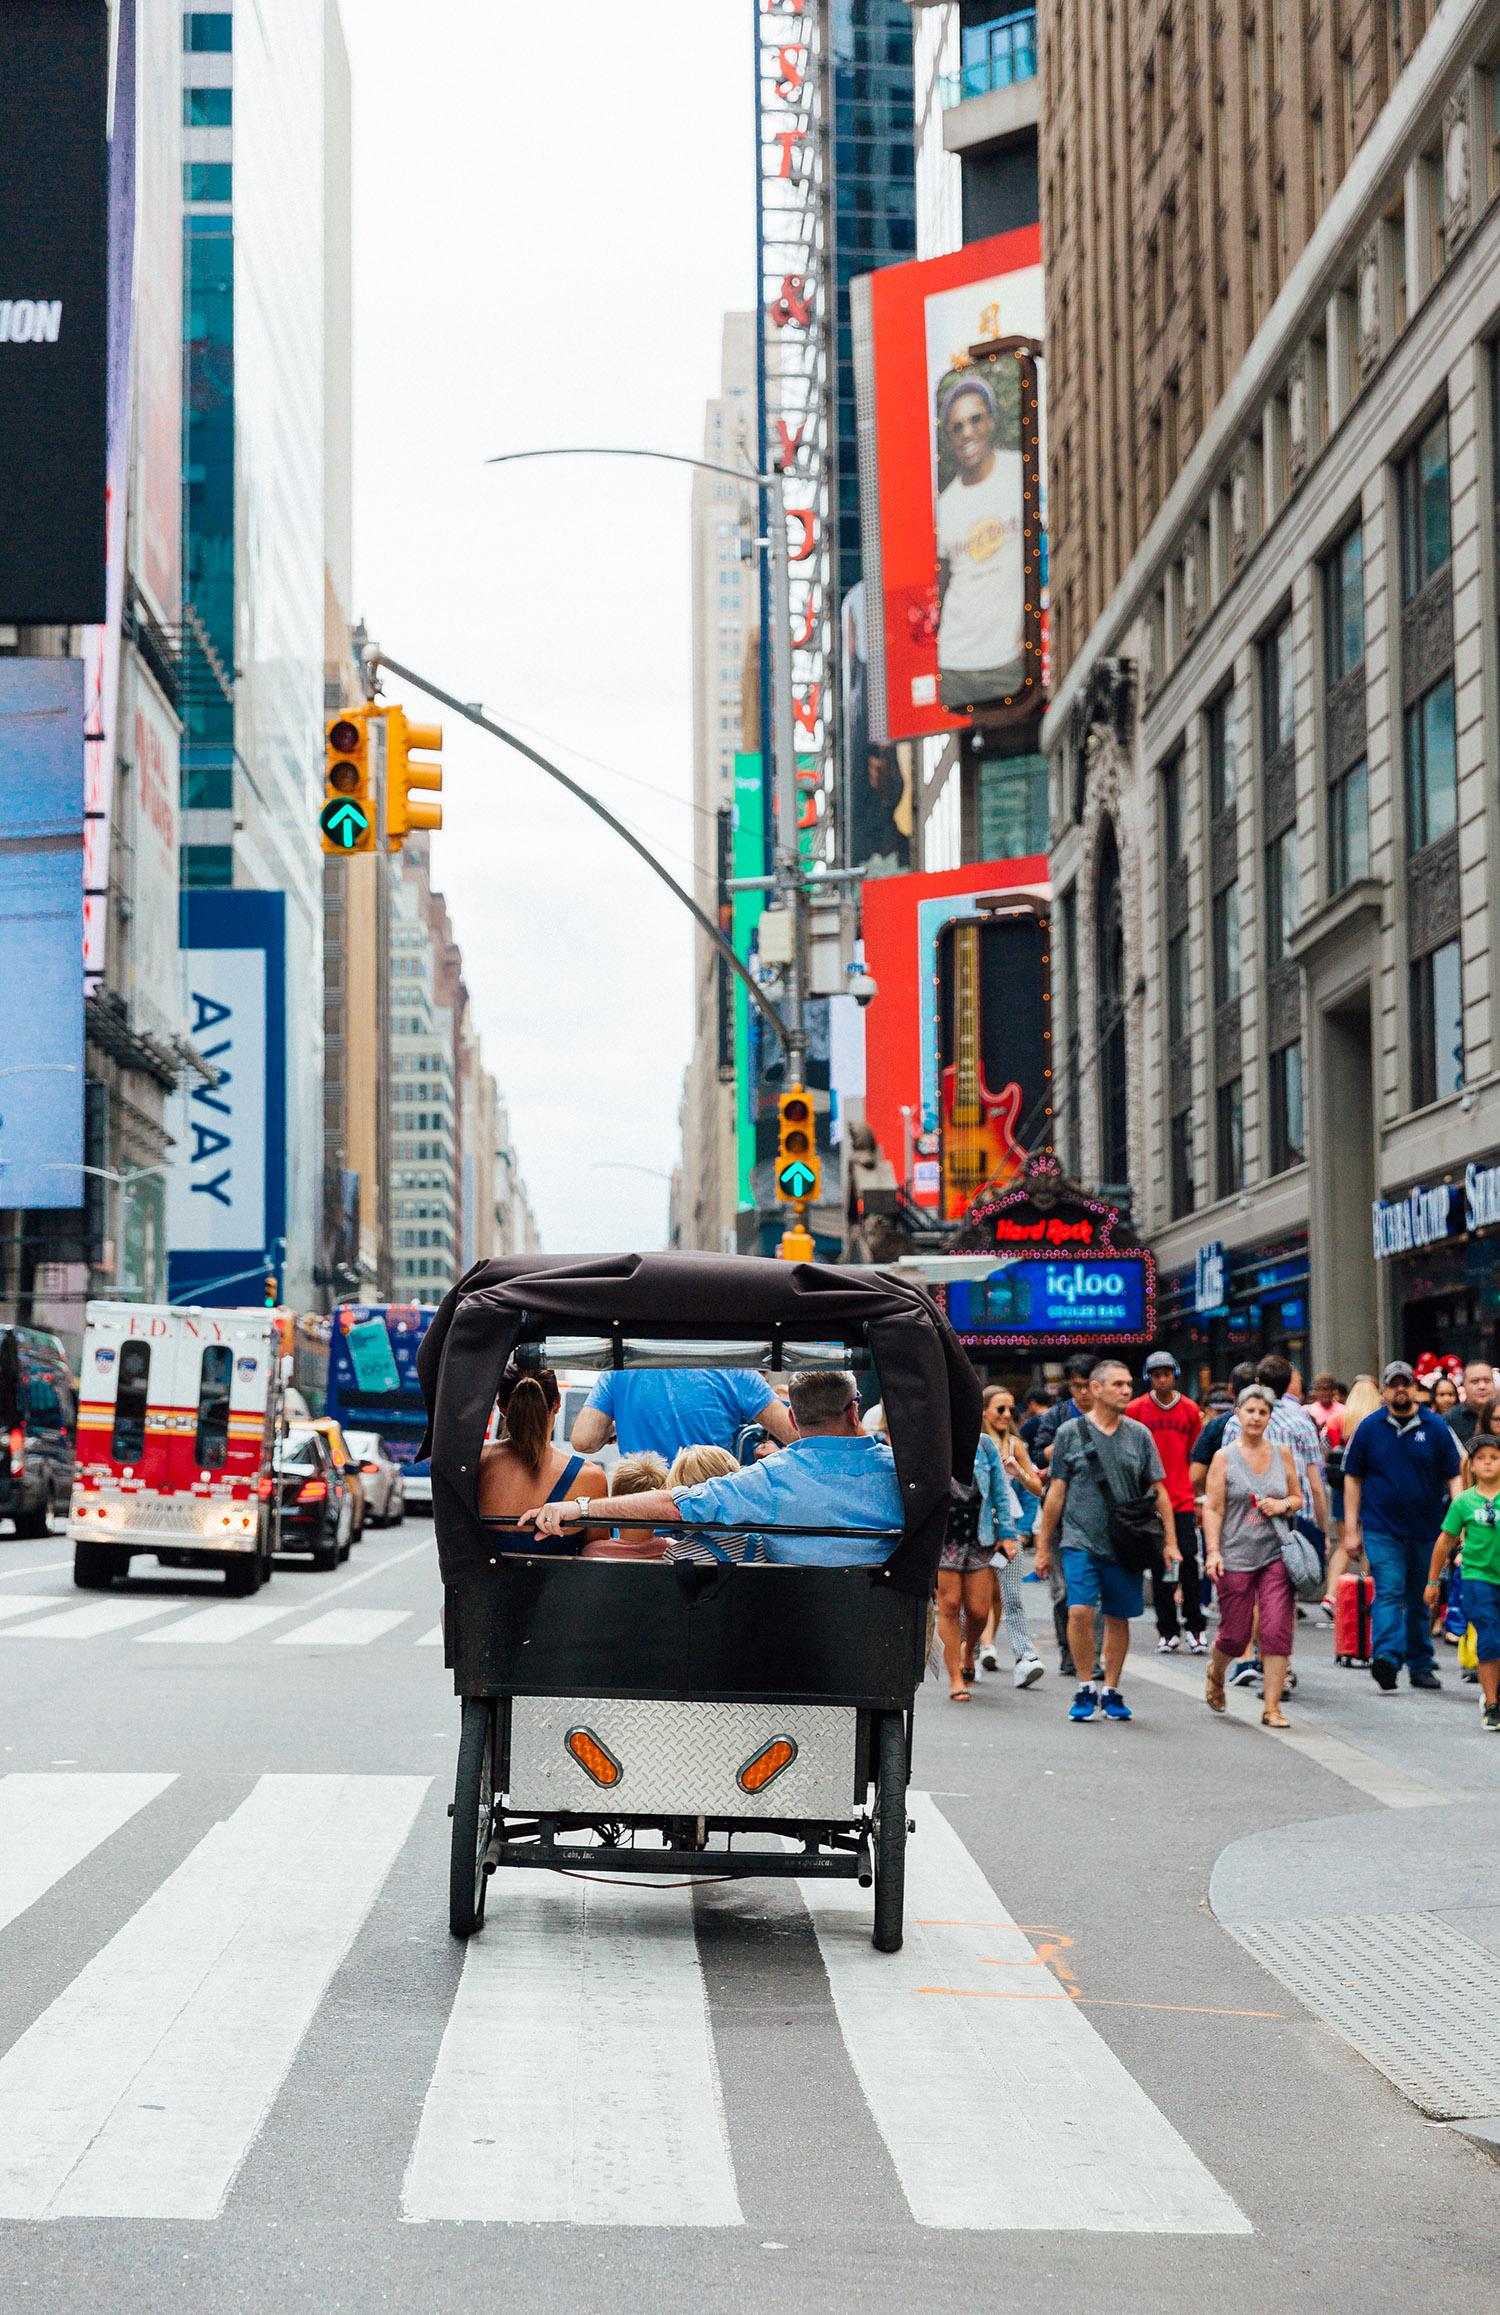 NYC_072018 (14 of 36).jpg